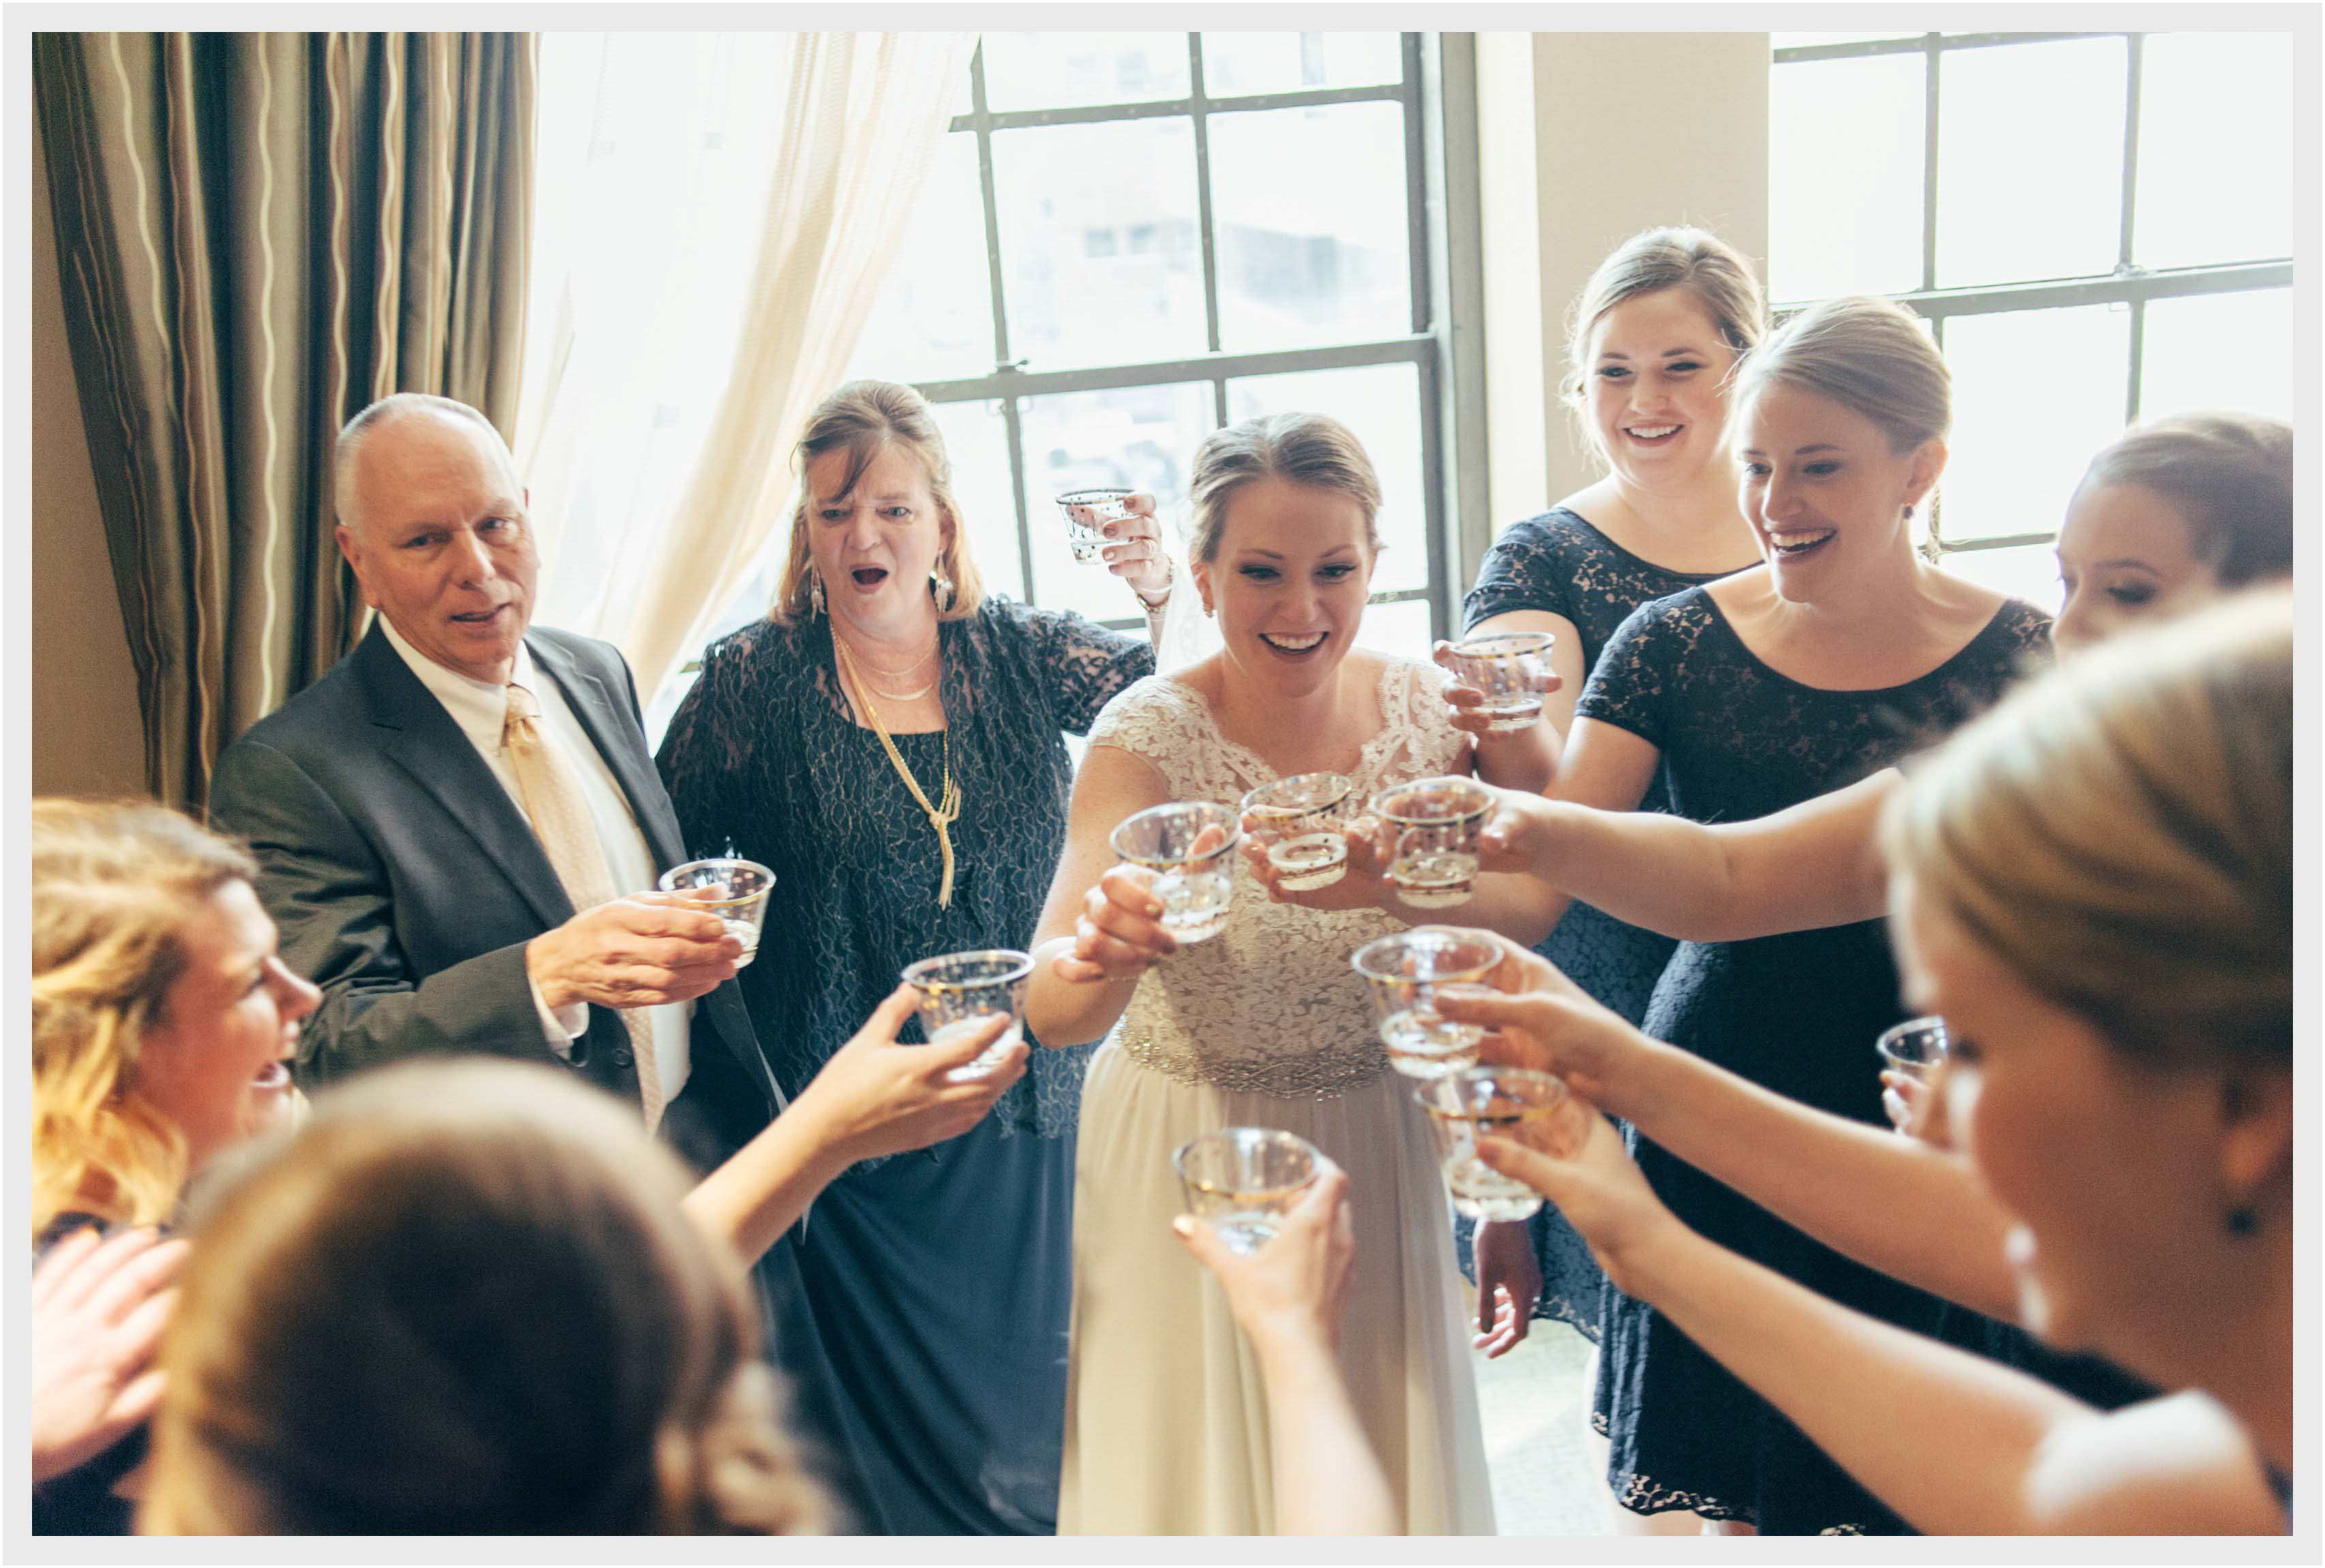 Rhinegeist wedding photos 7